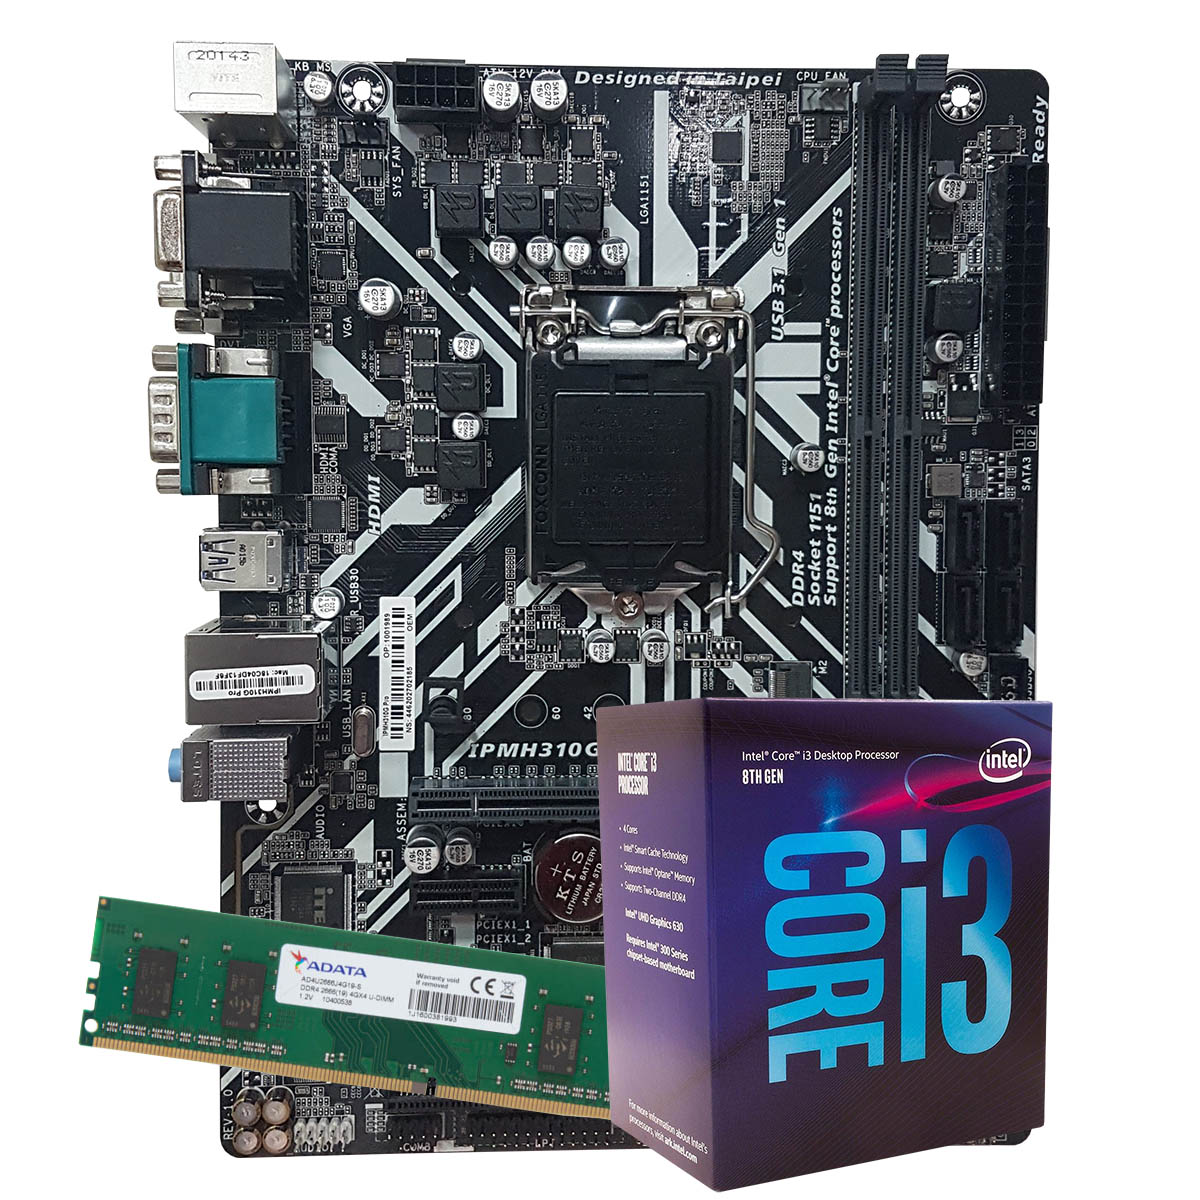 Kit Upgrade intel Corei3-9100 3.6Ghz, Placa Mãe Pcware IPMH310G LGA 1151,  8GB DDR4